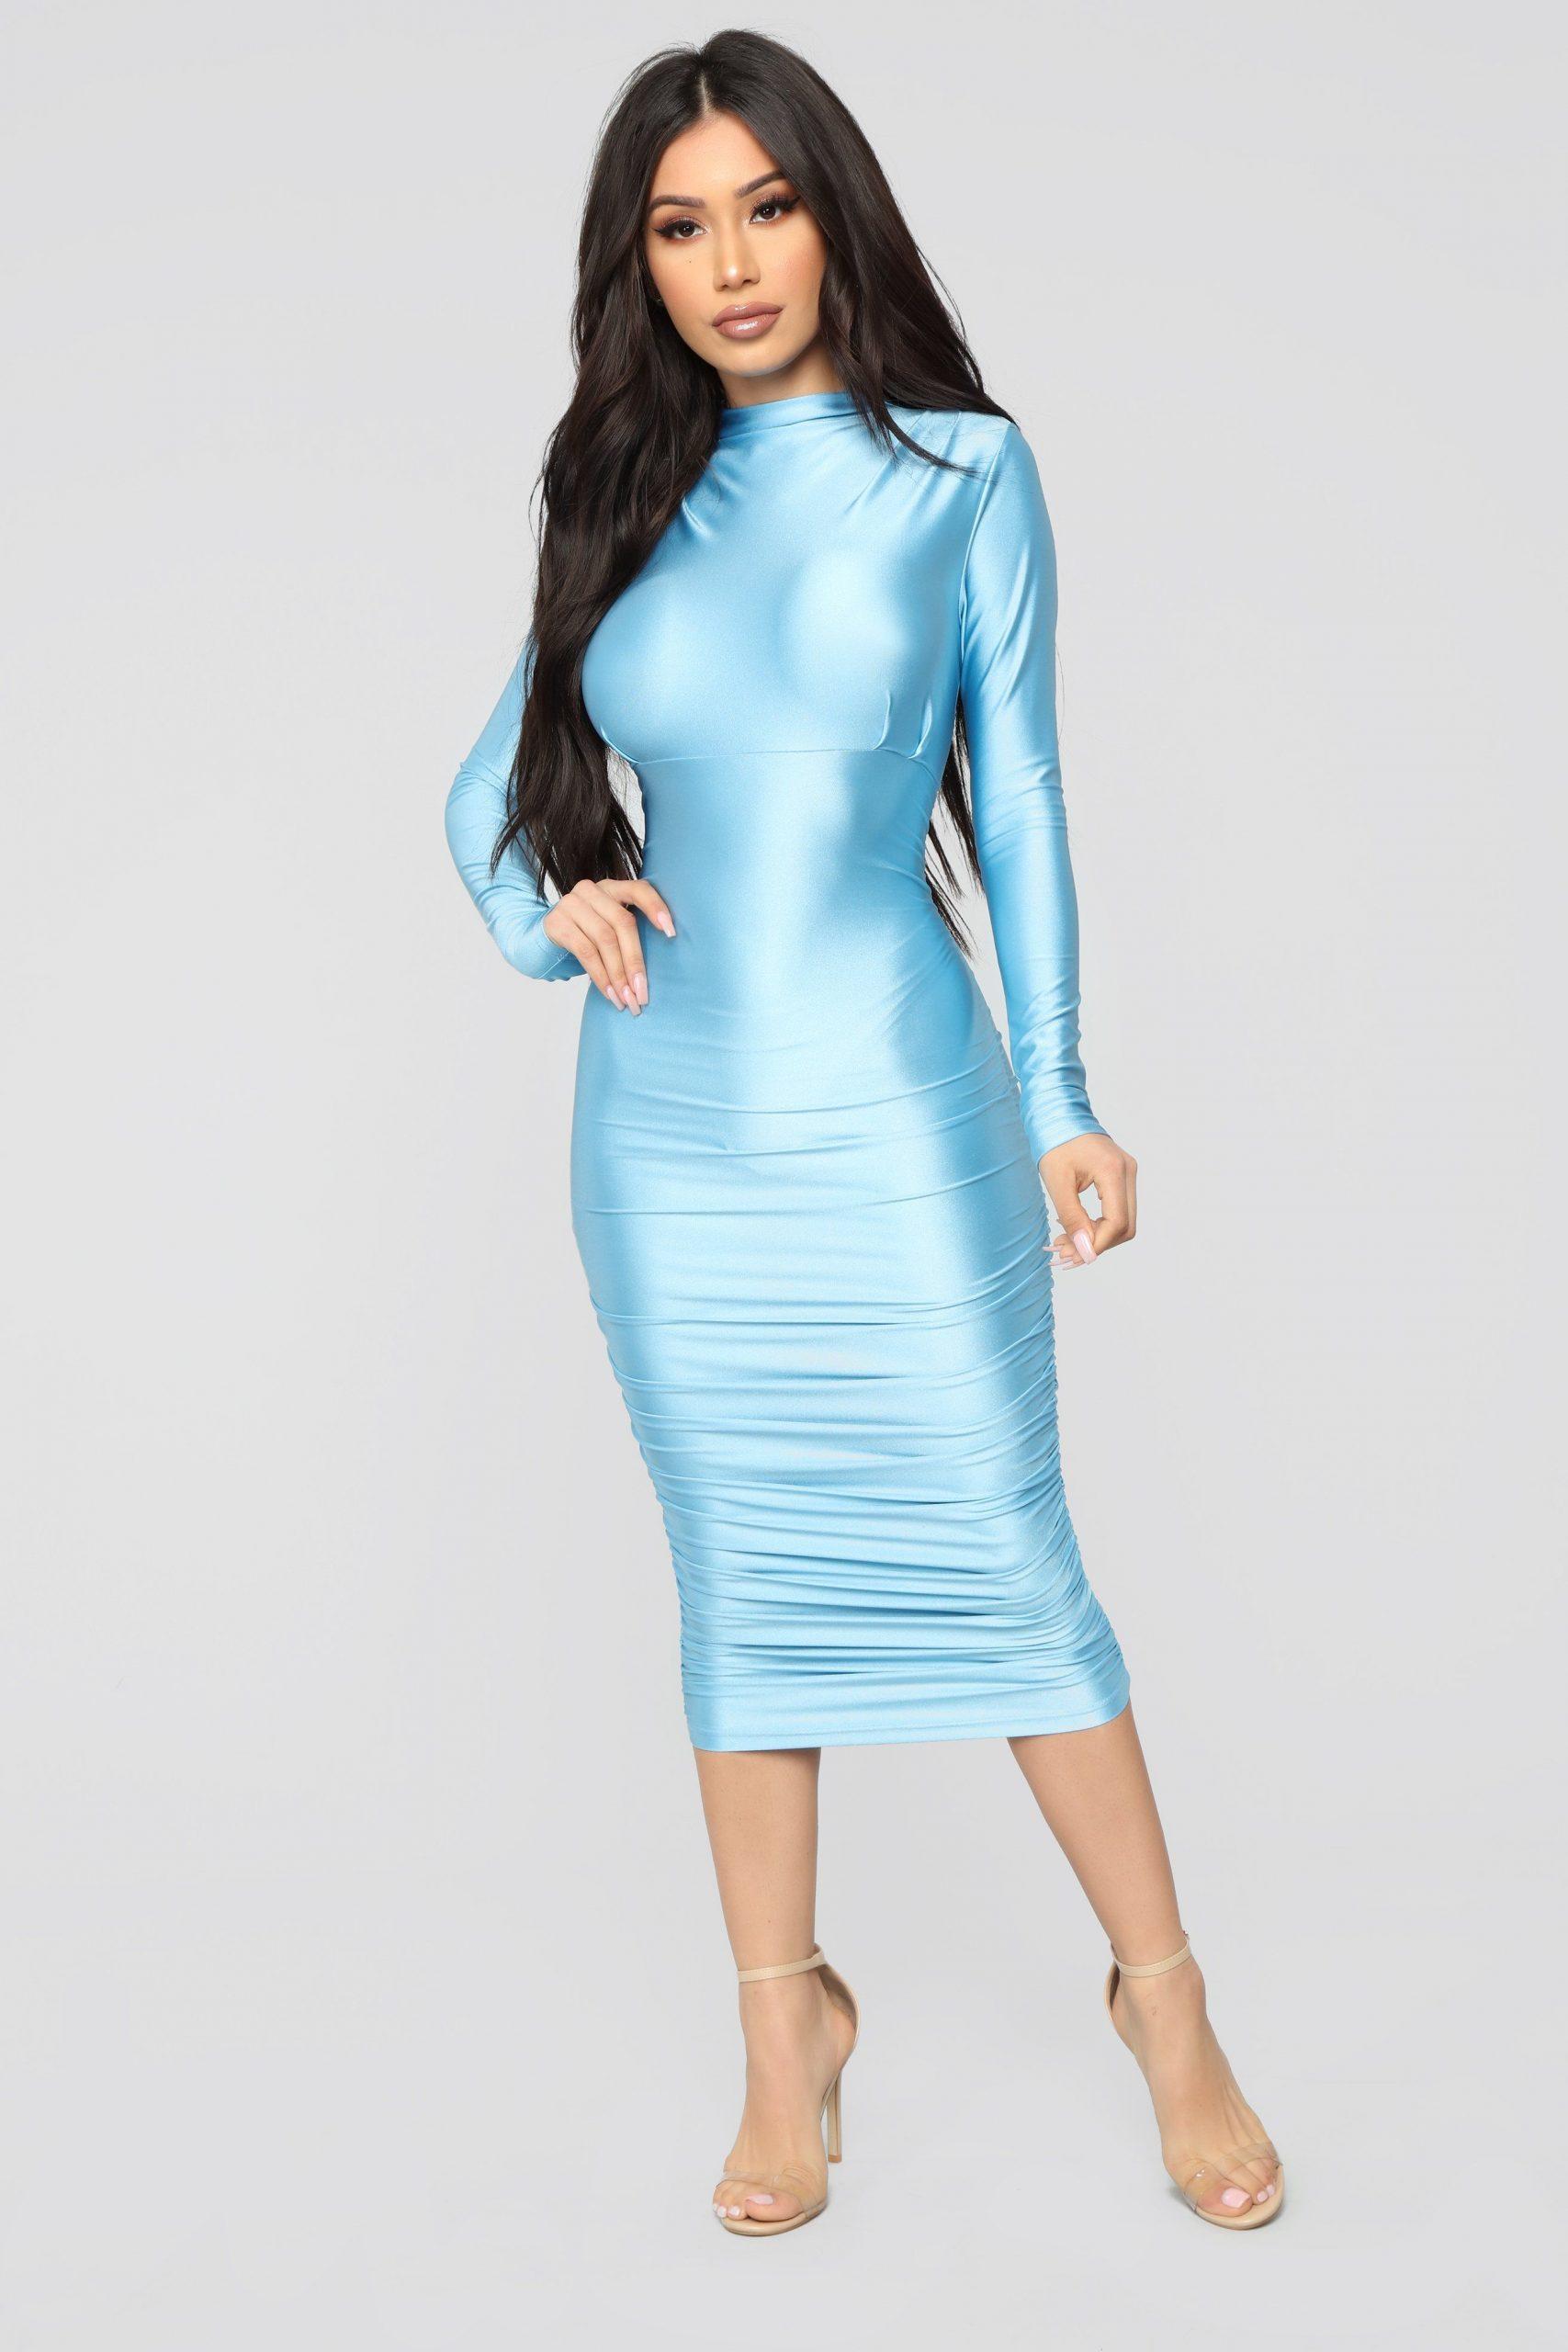 Sexiga Midi Dress Idéer